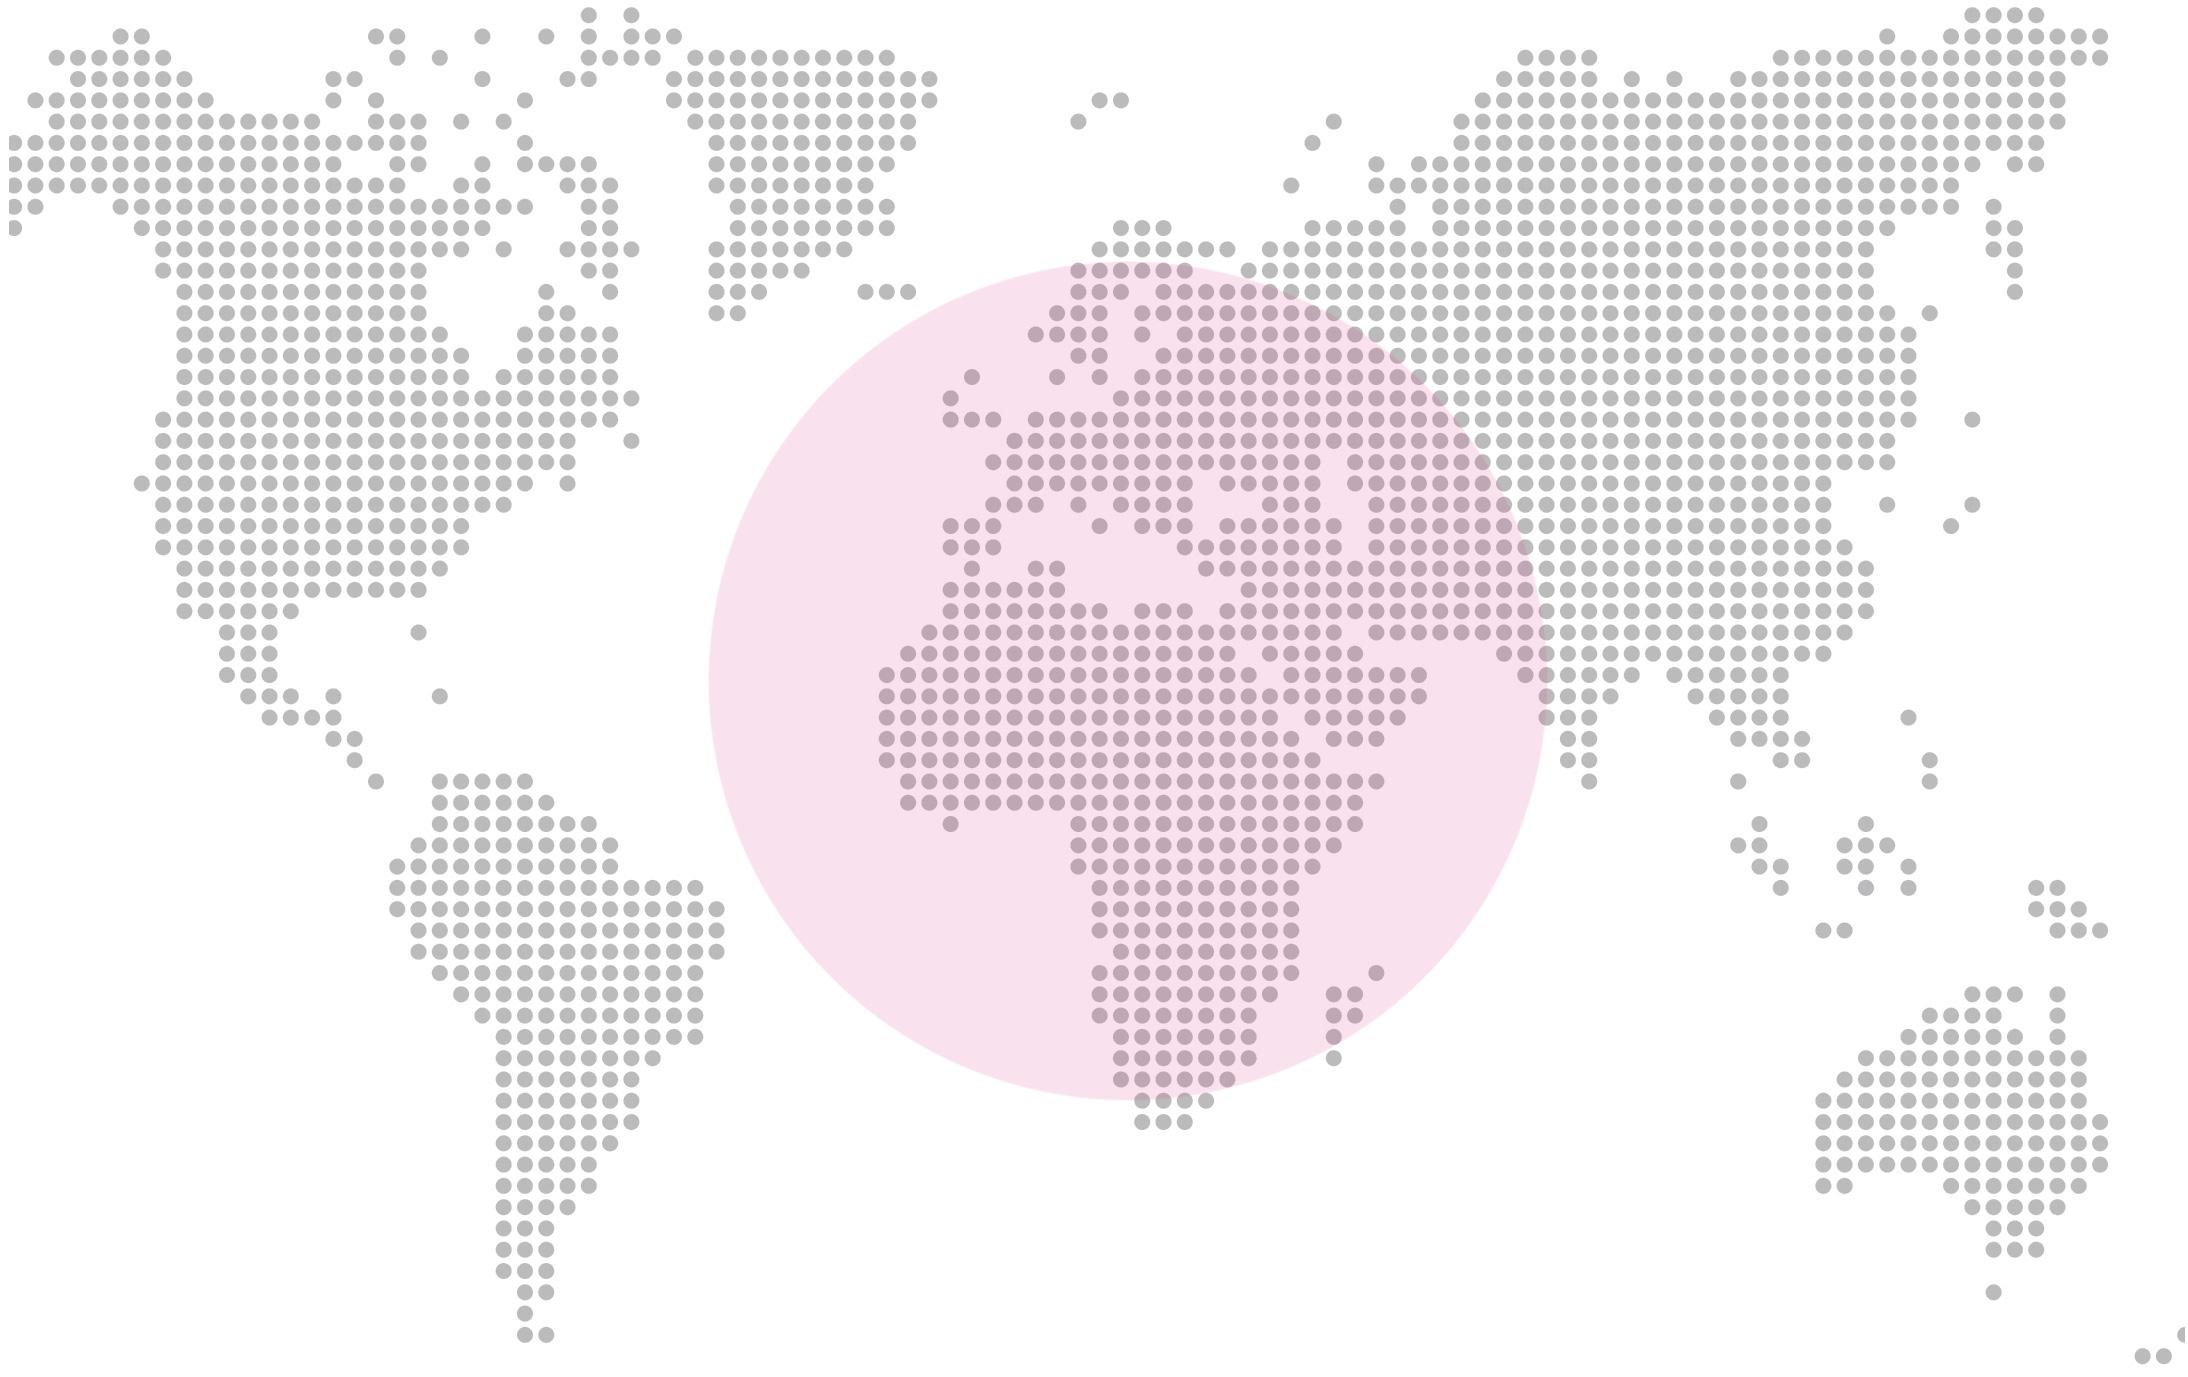 World map - Global pin